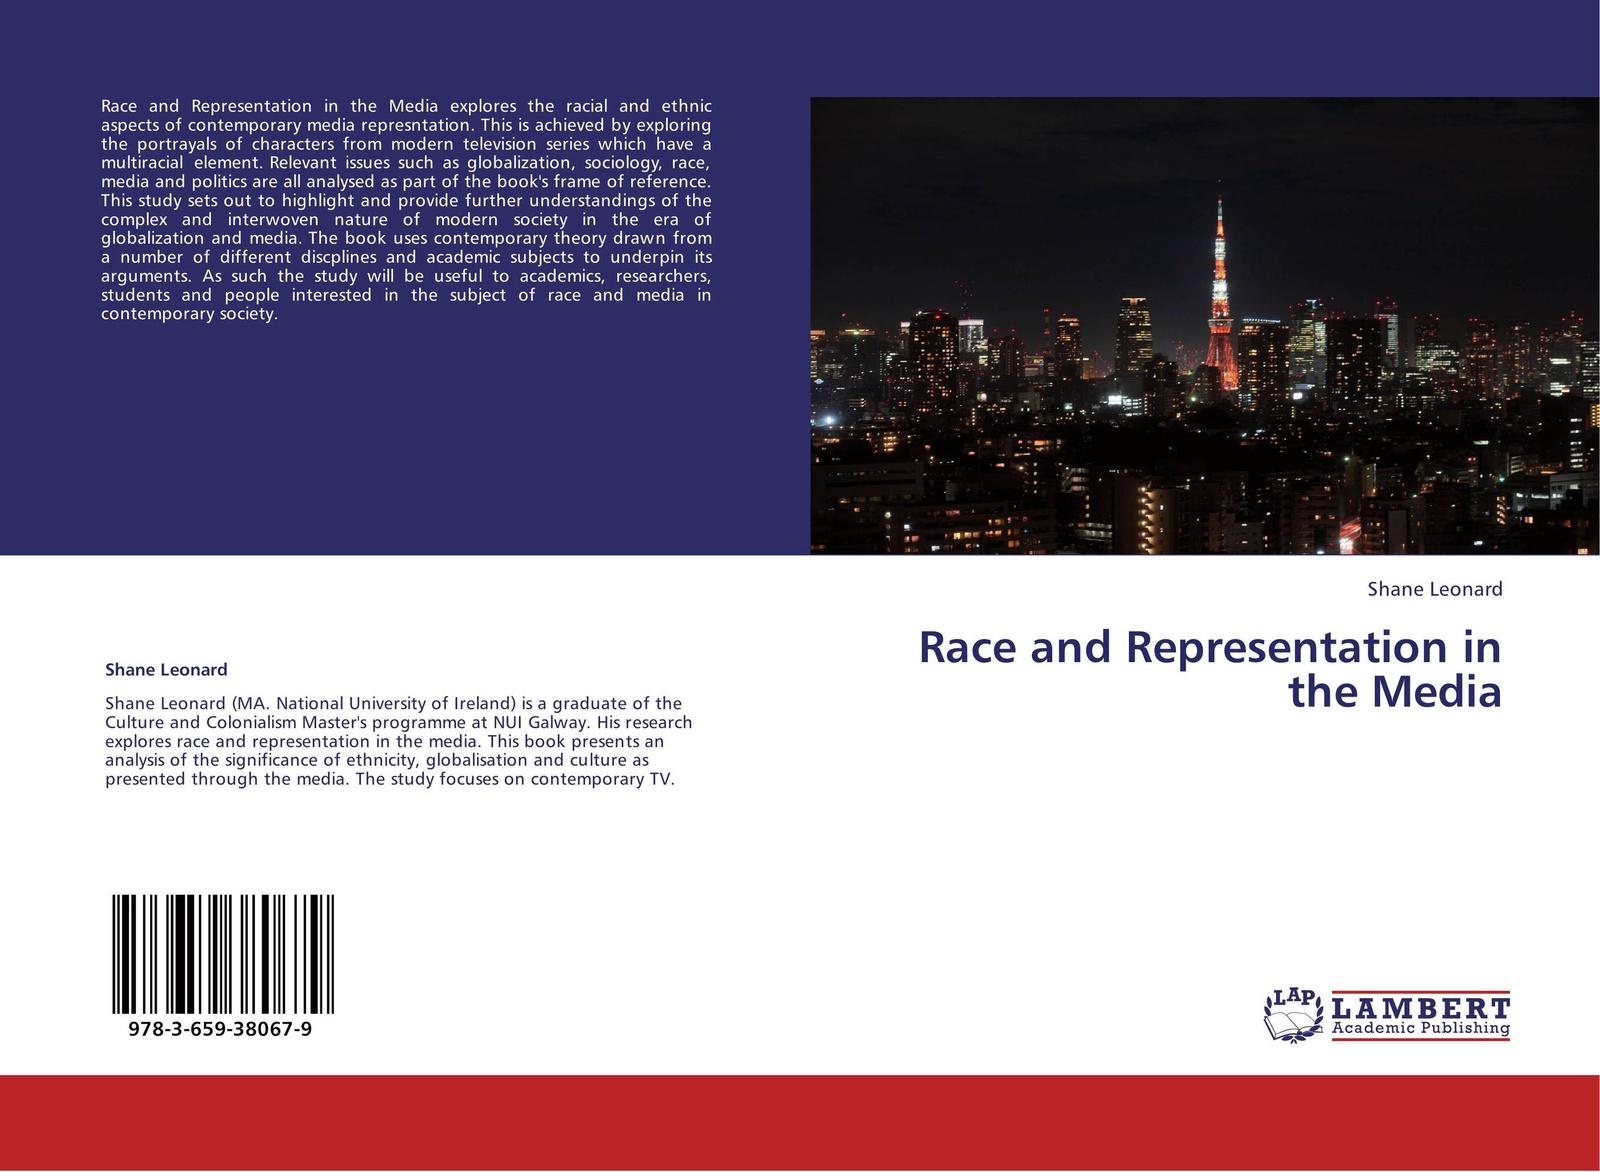 цены Shane Leonard Race and Representation in the Media